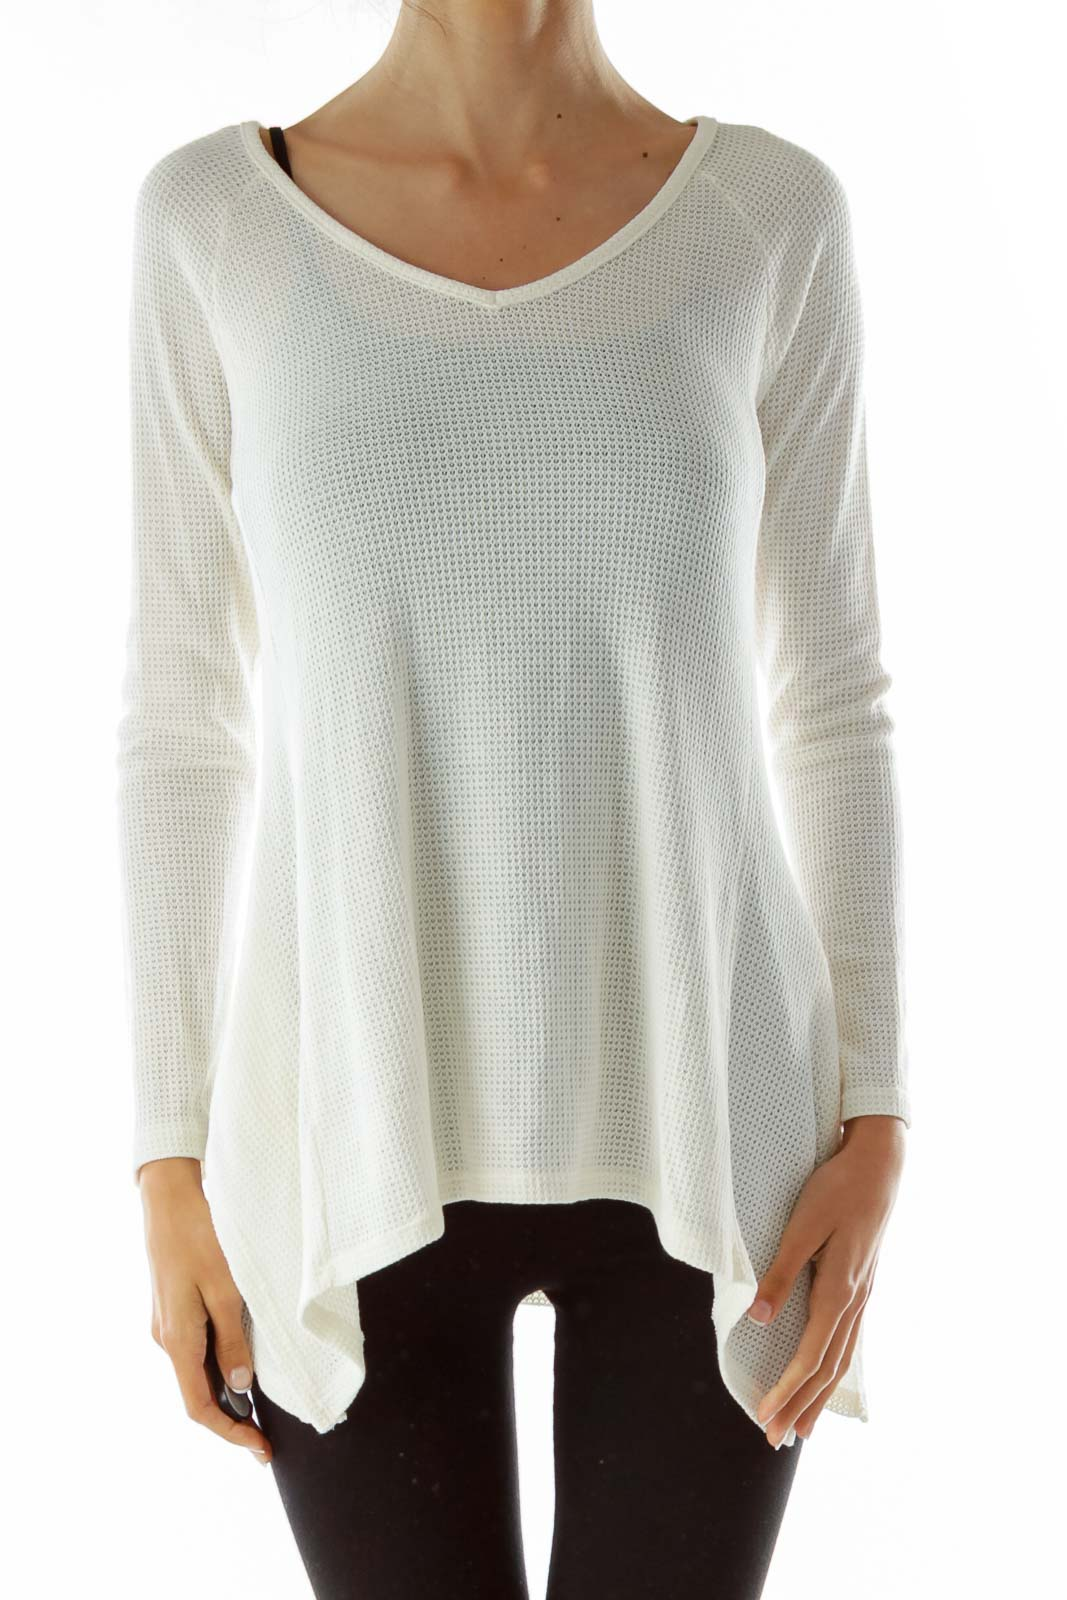 Cream Crocheted Knit Sweater